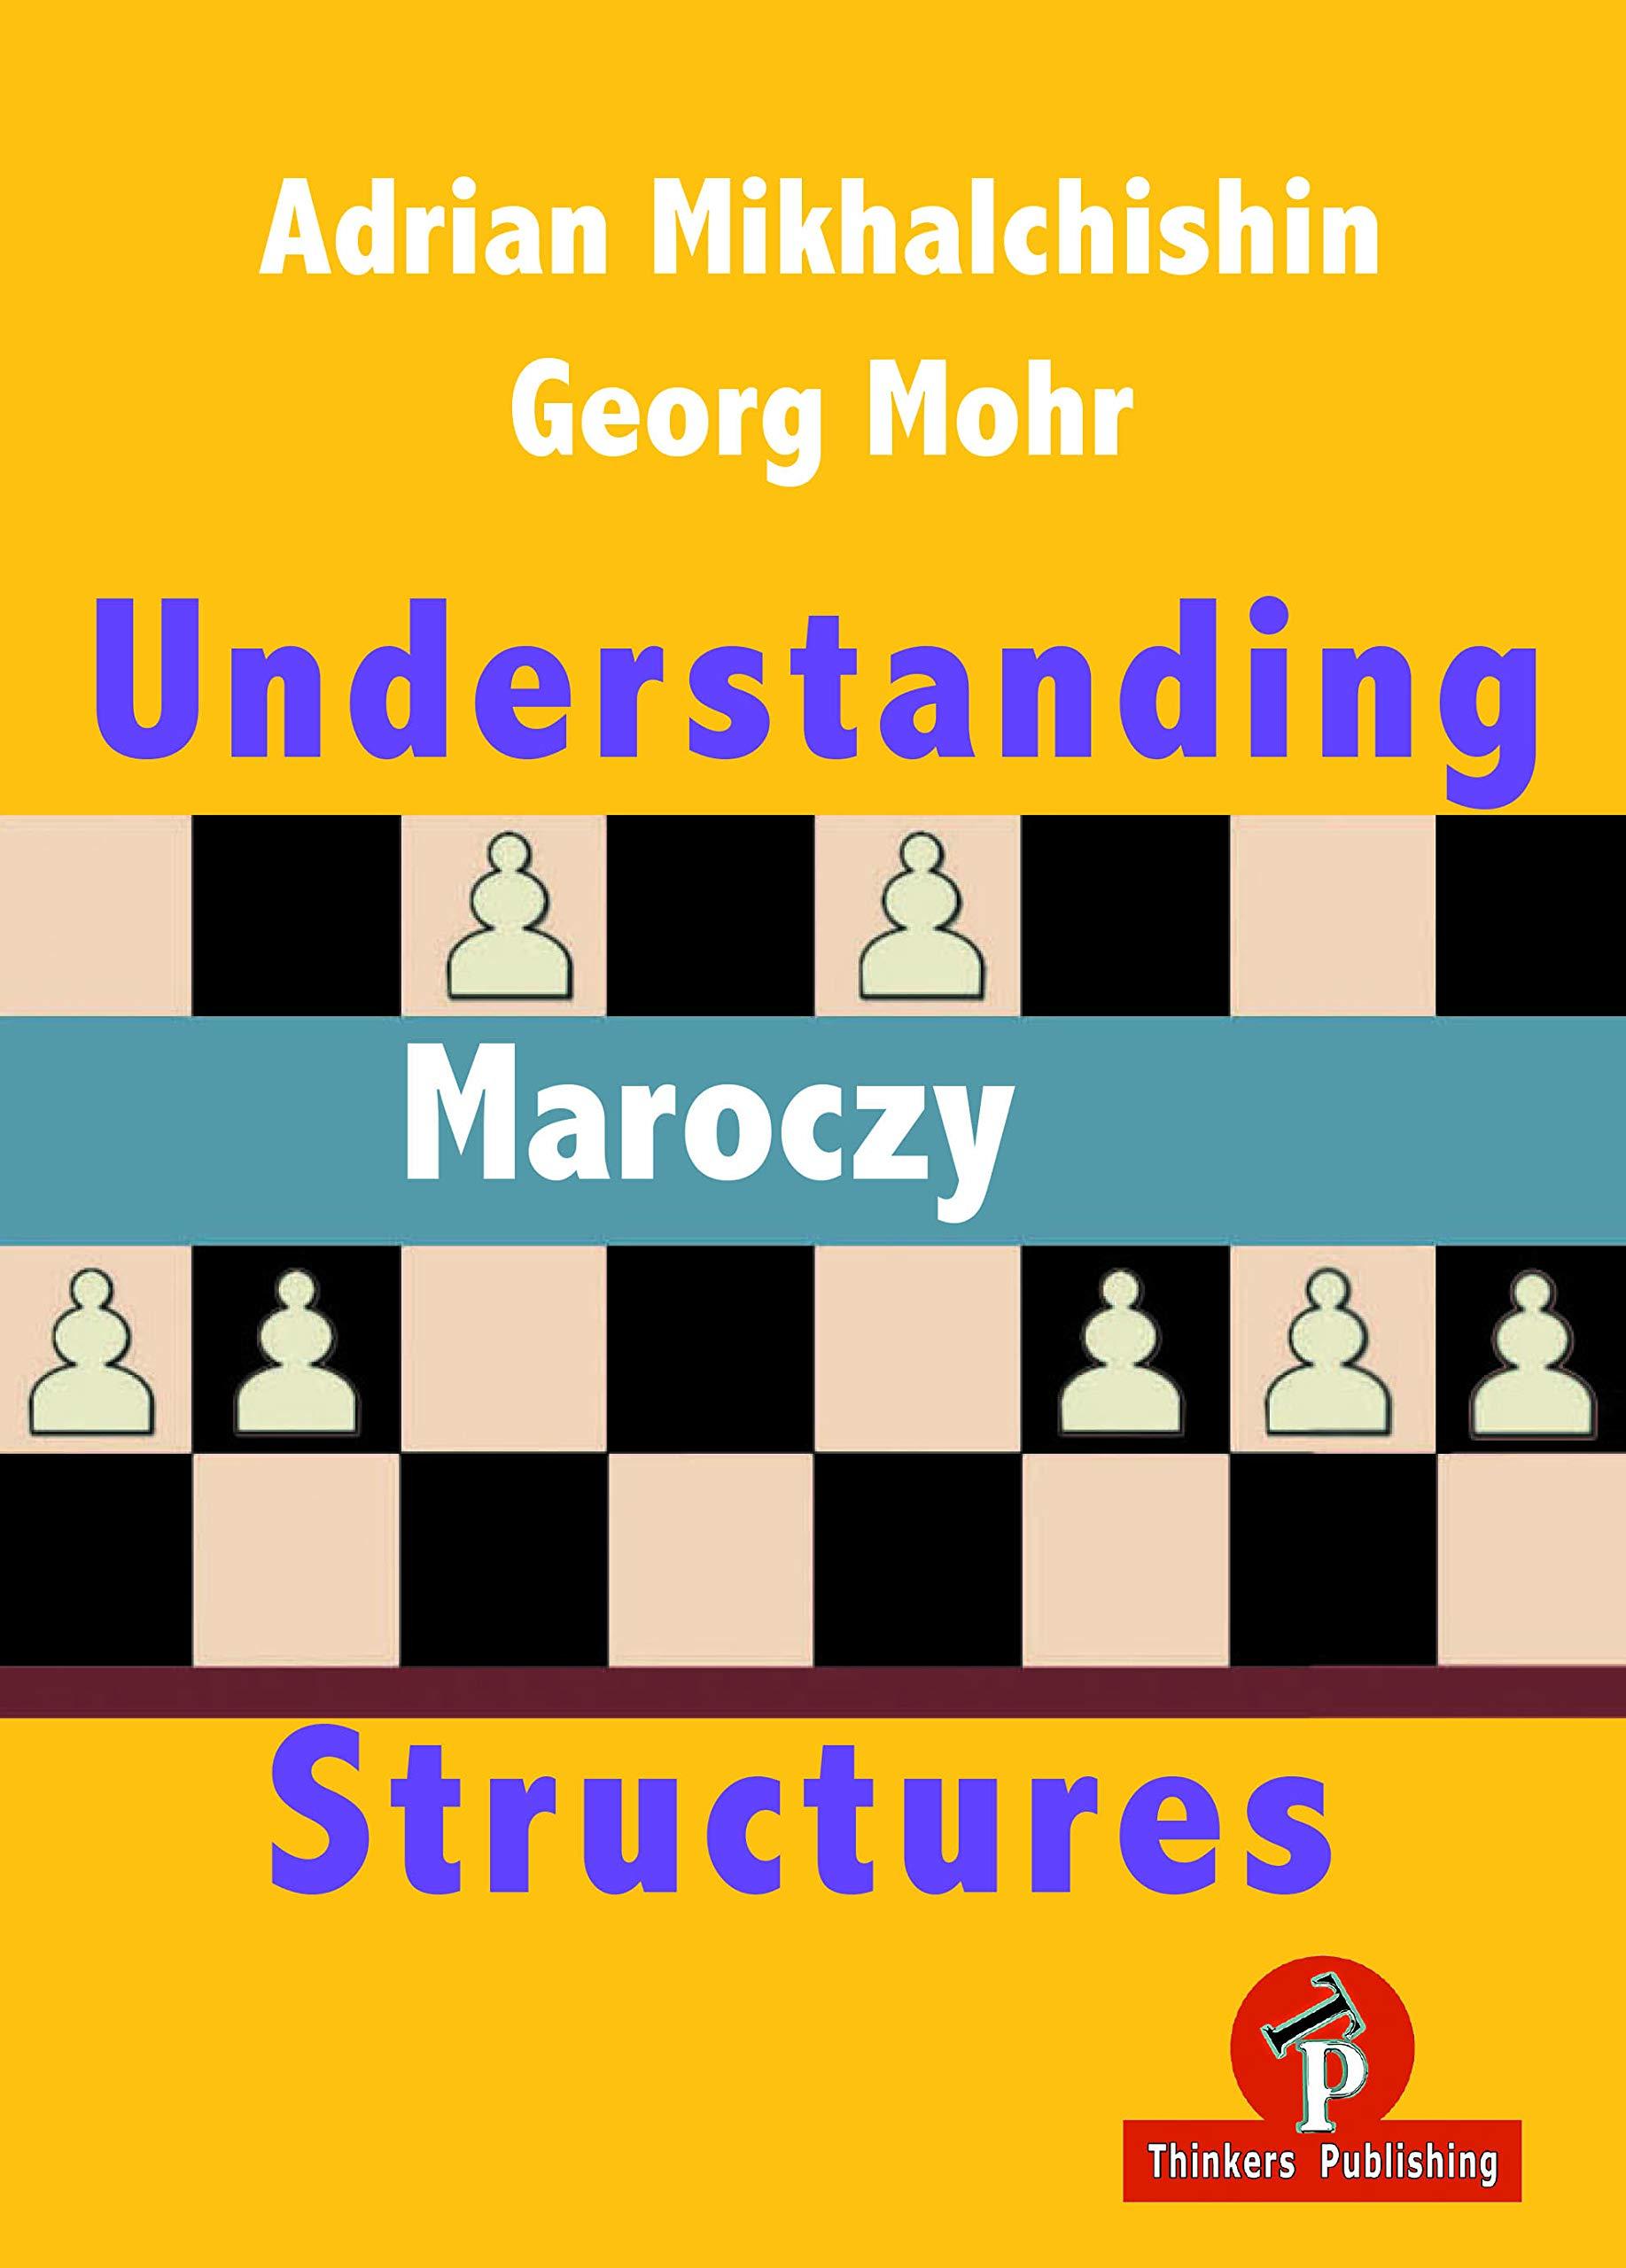 Understanding Maroczy Structures, Adrian Bohdanovych Mikhalchishin and Georg Mohr, Thinker's Publishing, 2019, ISBN-13  :  978-9492510549